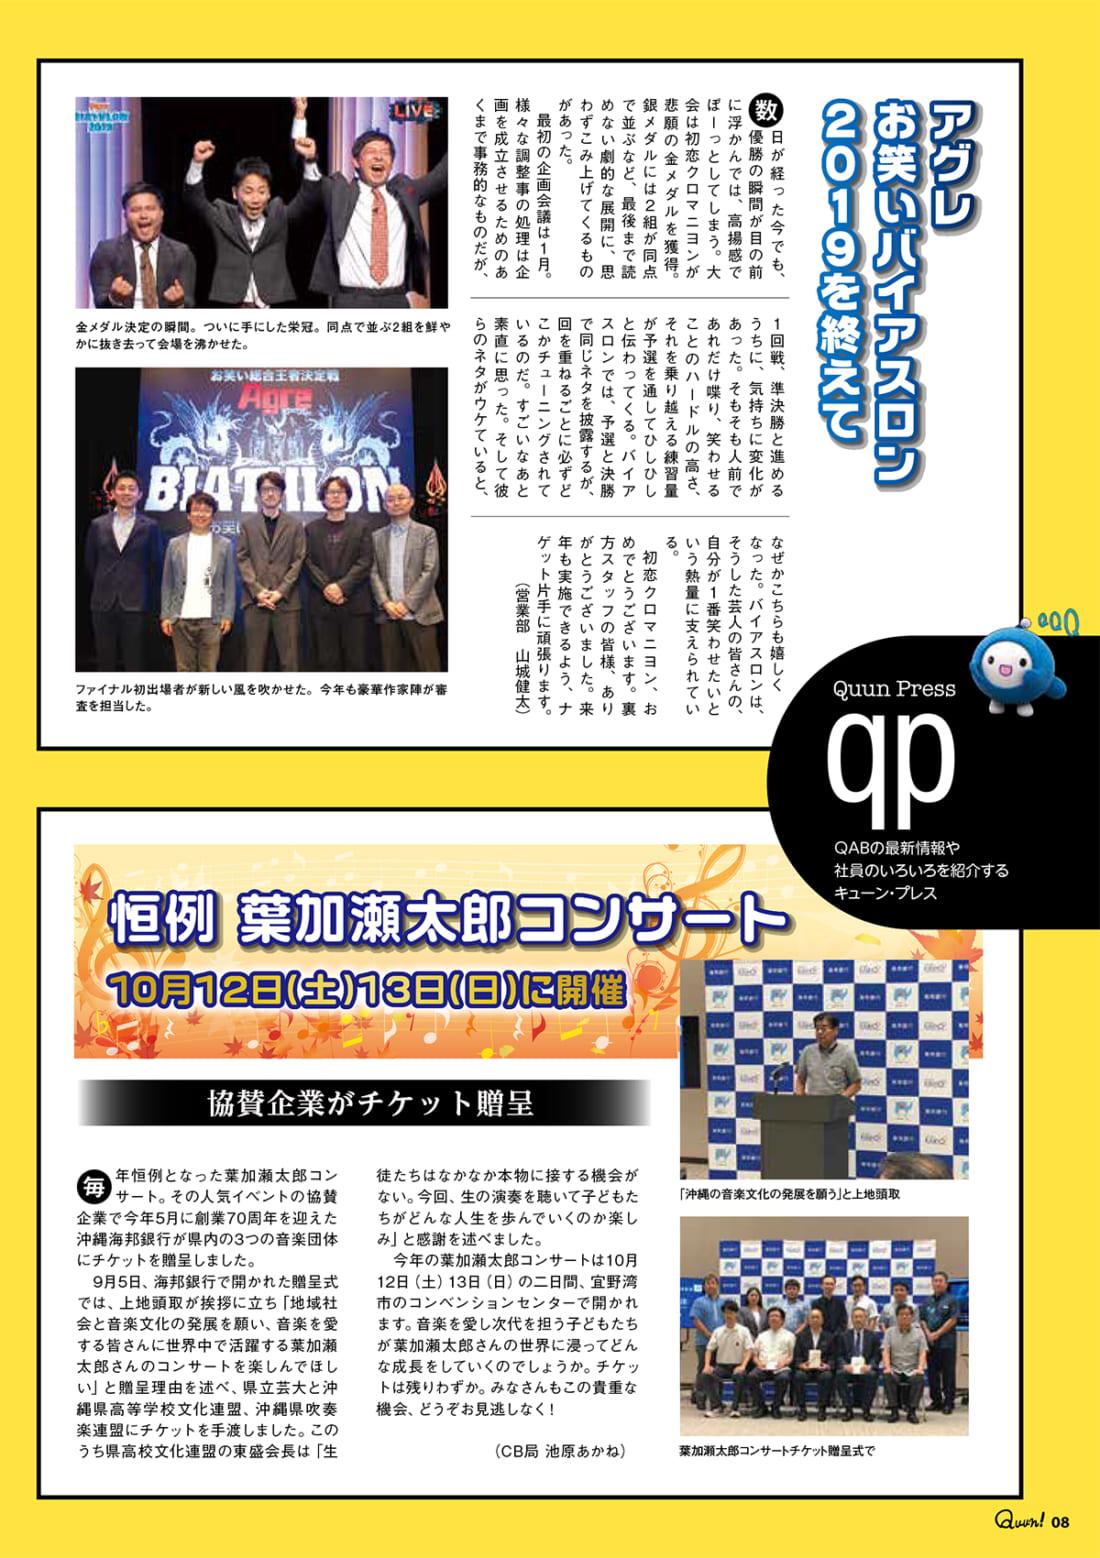 https://www.qab.co.jp/qgoro/wp-content/uploads/quun_1210-1100x1558.jpg